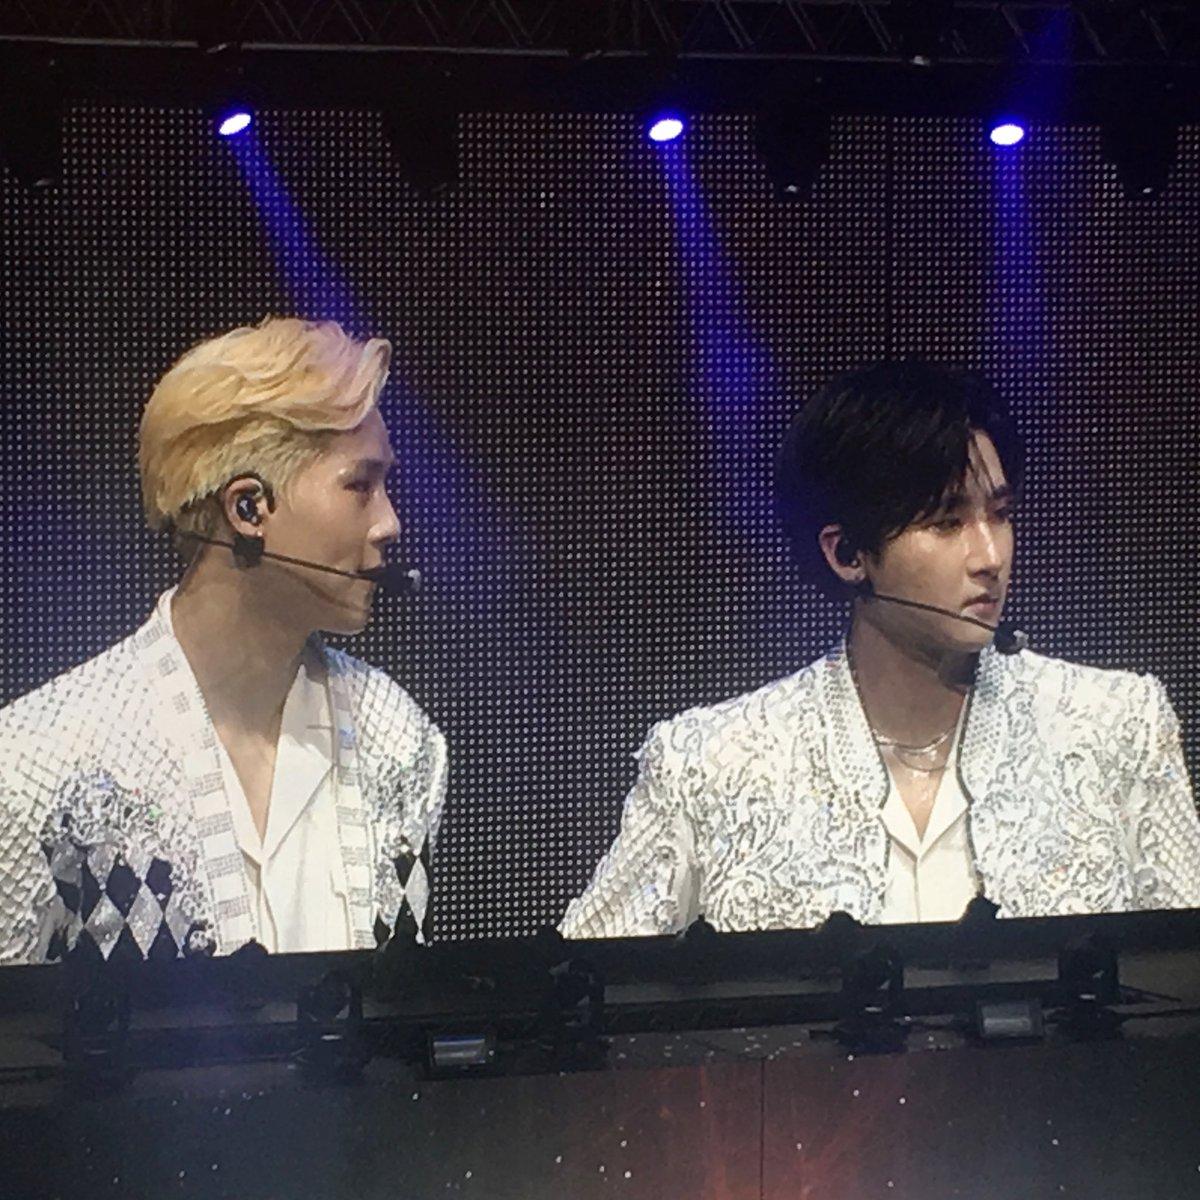 Such an awesome duo! ©justsome_kpopthings monsta x London June 2018 #imchangkyun #leejooheon #monstax #wonho #im #joohoney #minhyuk #jooheon #shownu #hyungwon #kihyun #kpop #starship #starshipentertainment #starshipprotectmonstax7 #TurnTheTideForMX7